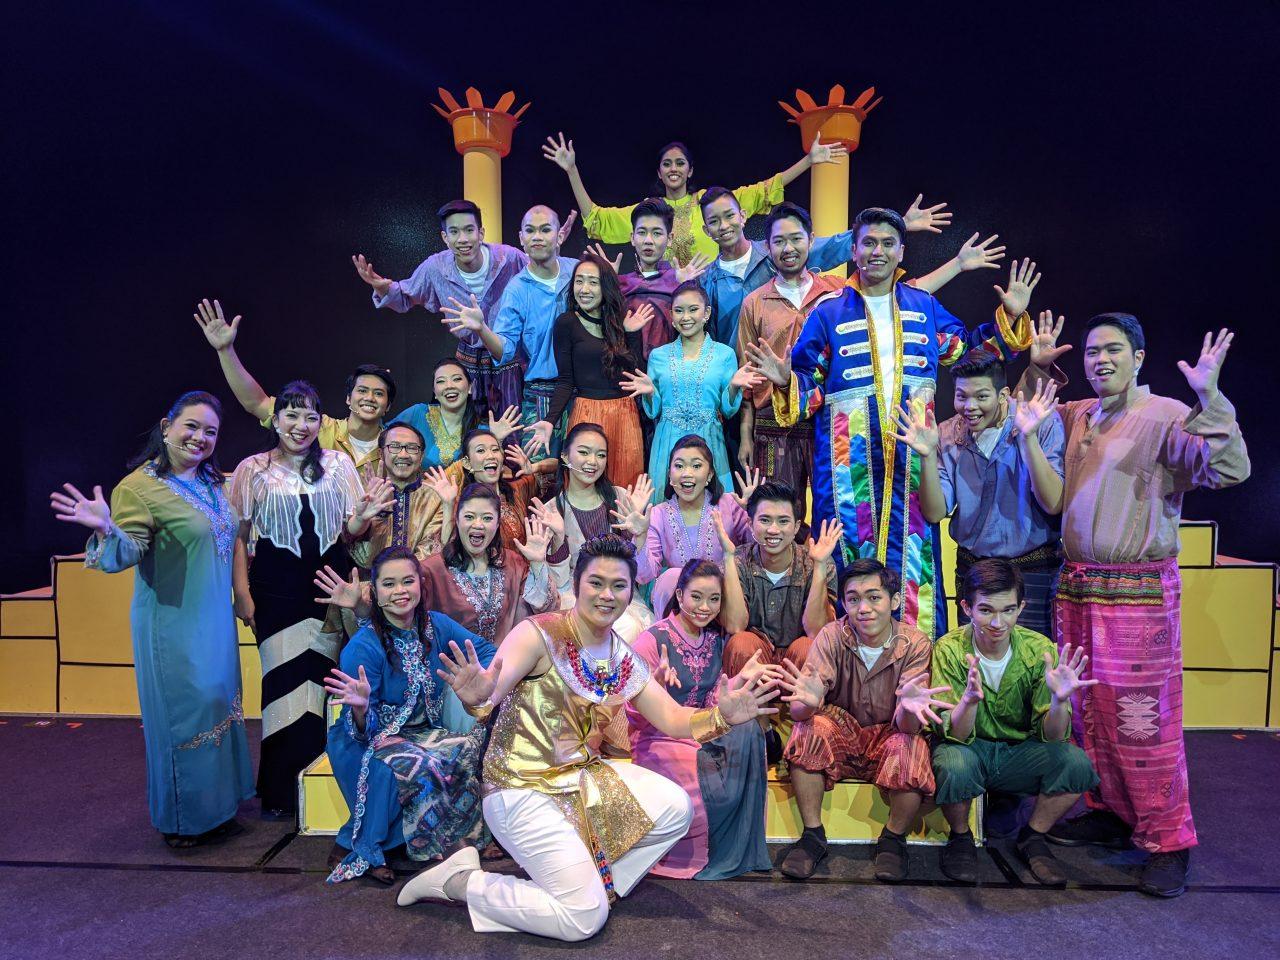 Internationally acclaimed 'Joseph' musical receives tremendous response